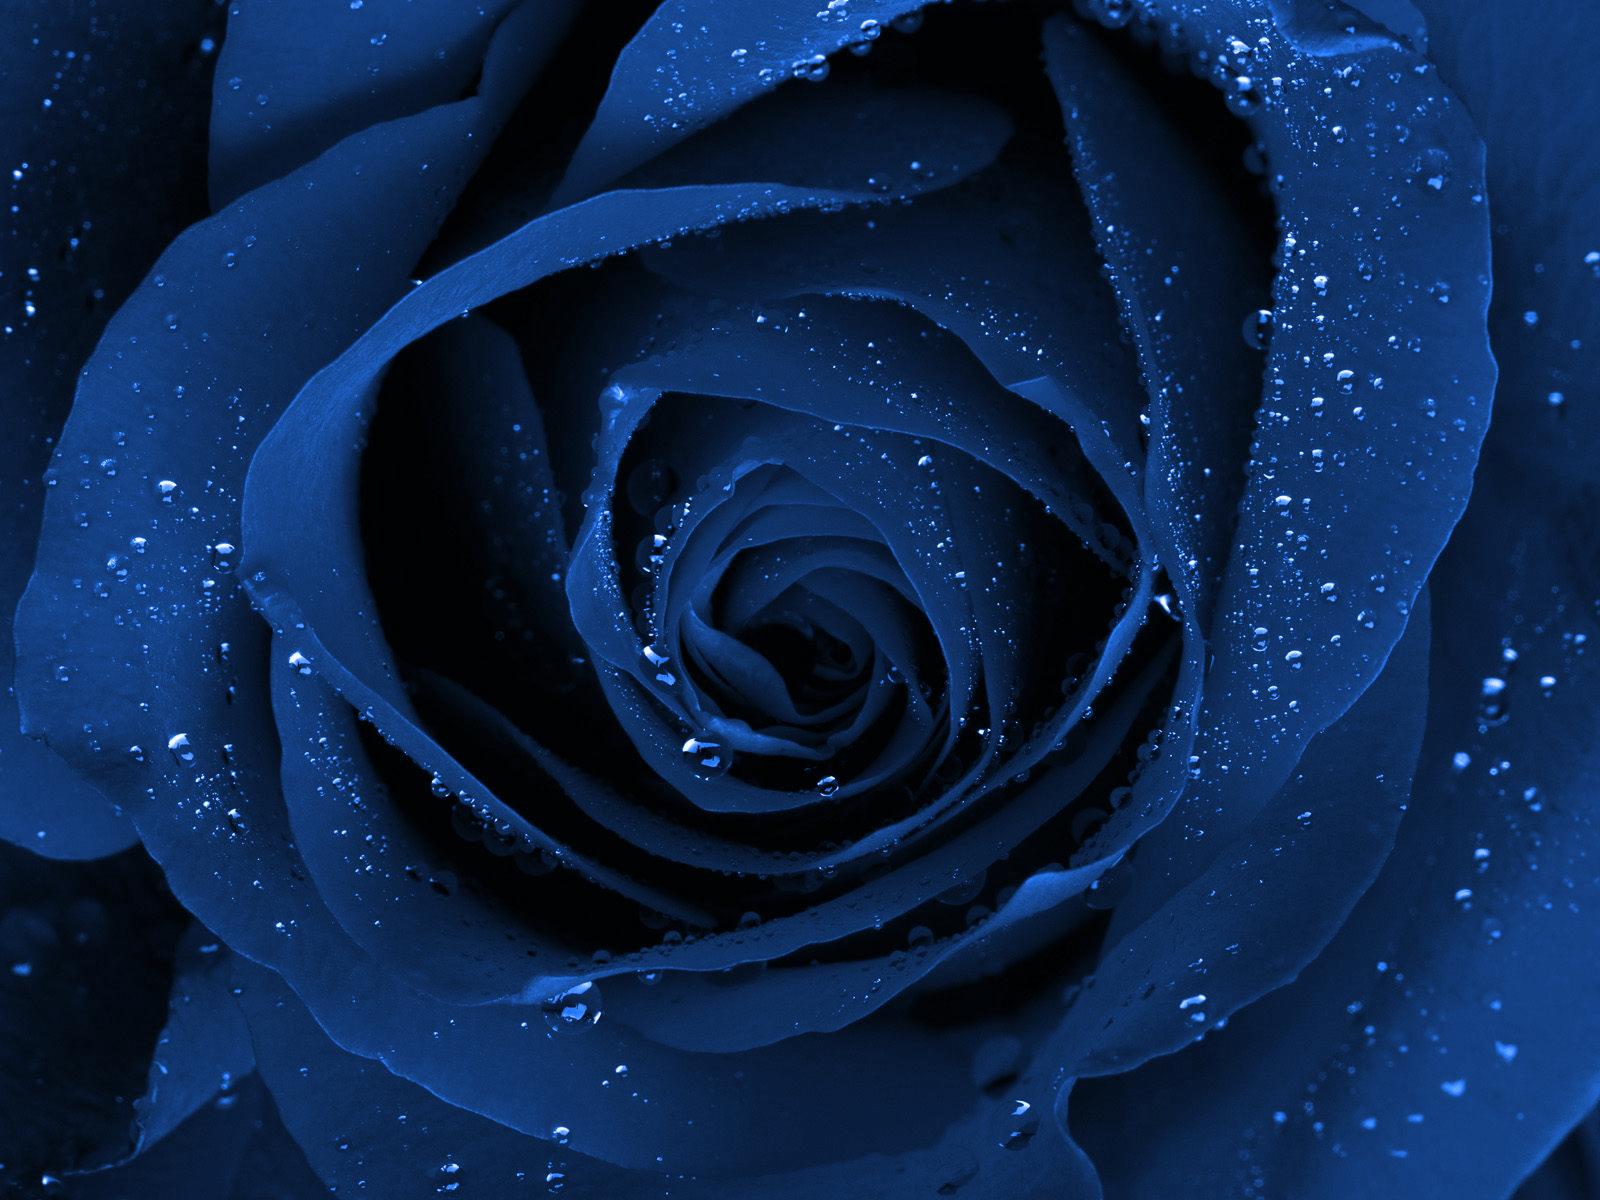 Beautiful Rose Flower Wallpaper Backgrounds